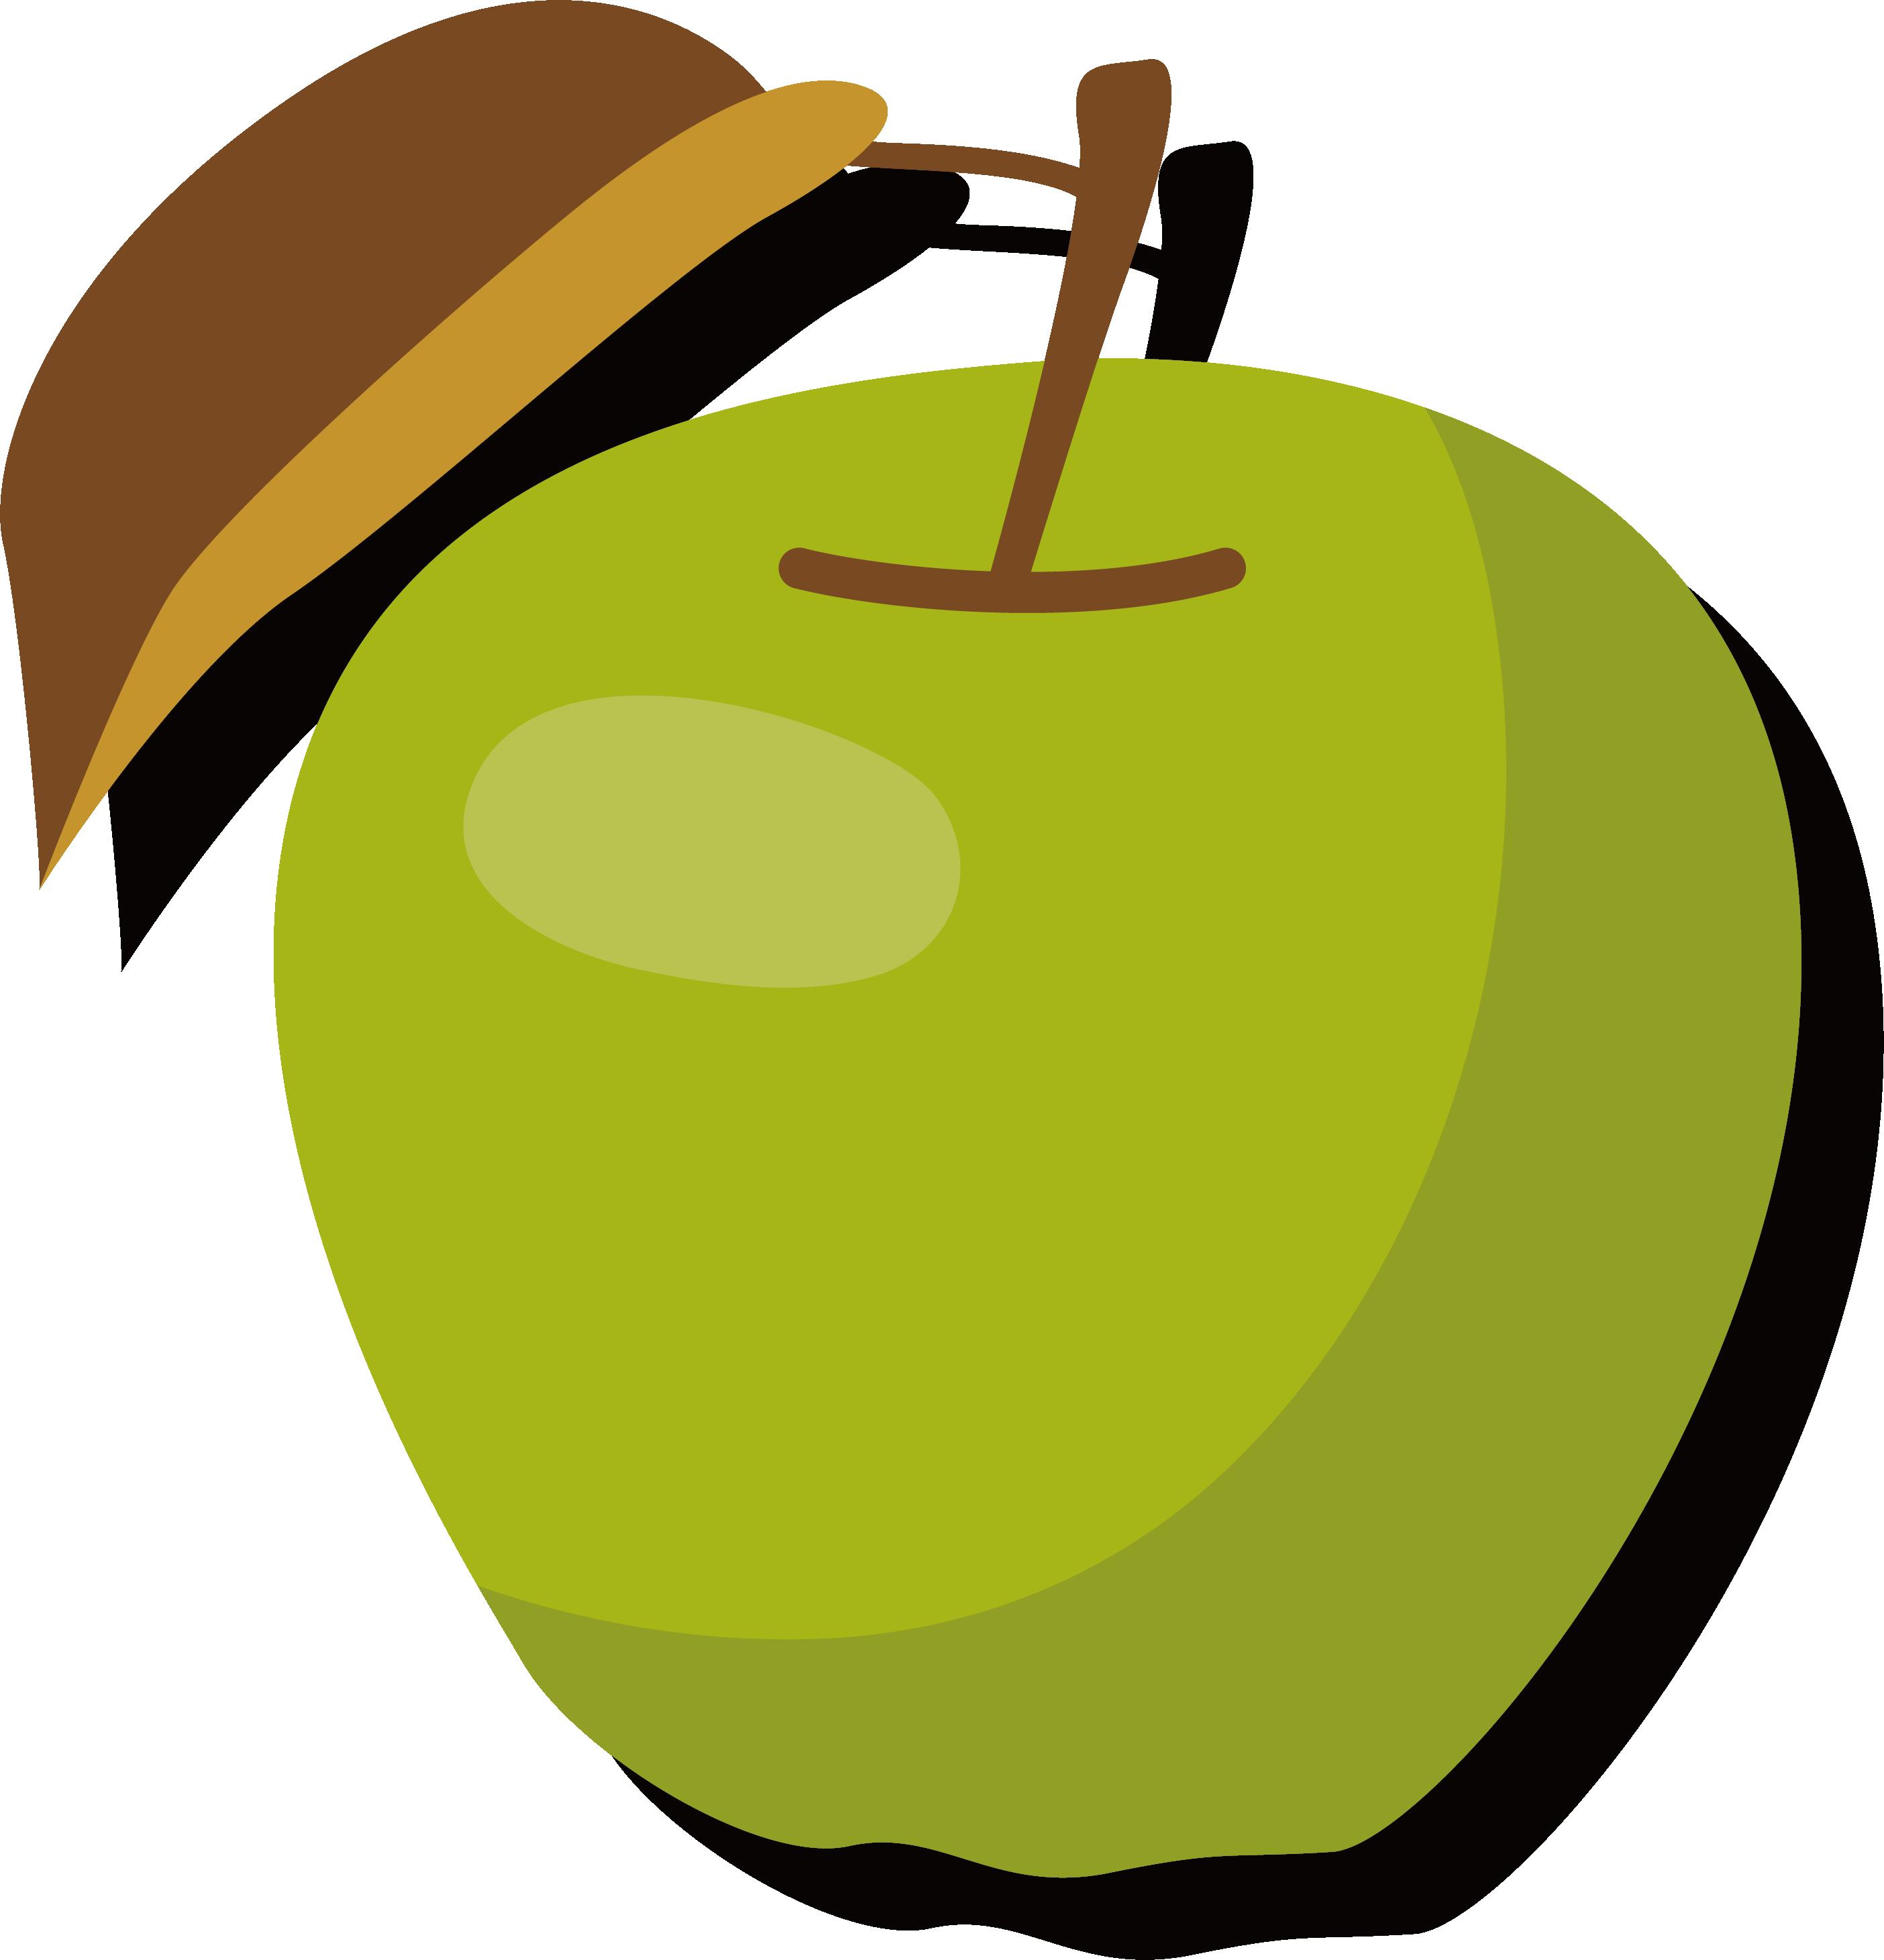 Green apple tree clipart clip art freeuse download Apple Manzana verde Clip art - Ripe green apple 2808*2922 transprent ... clip art freeuse download